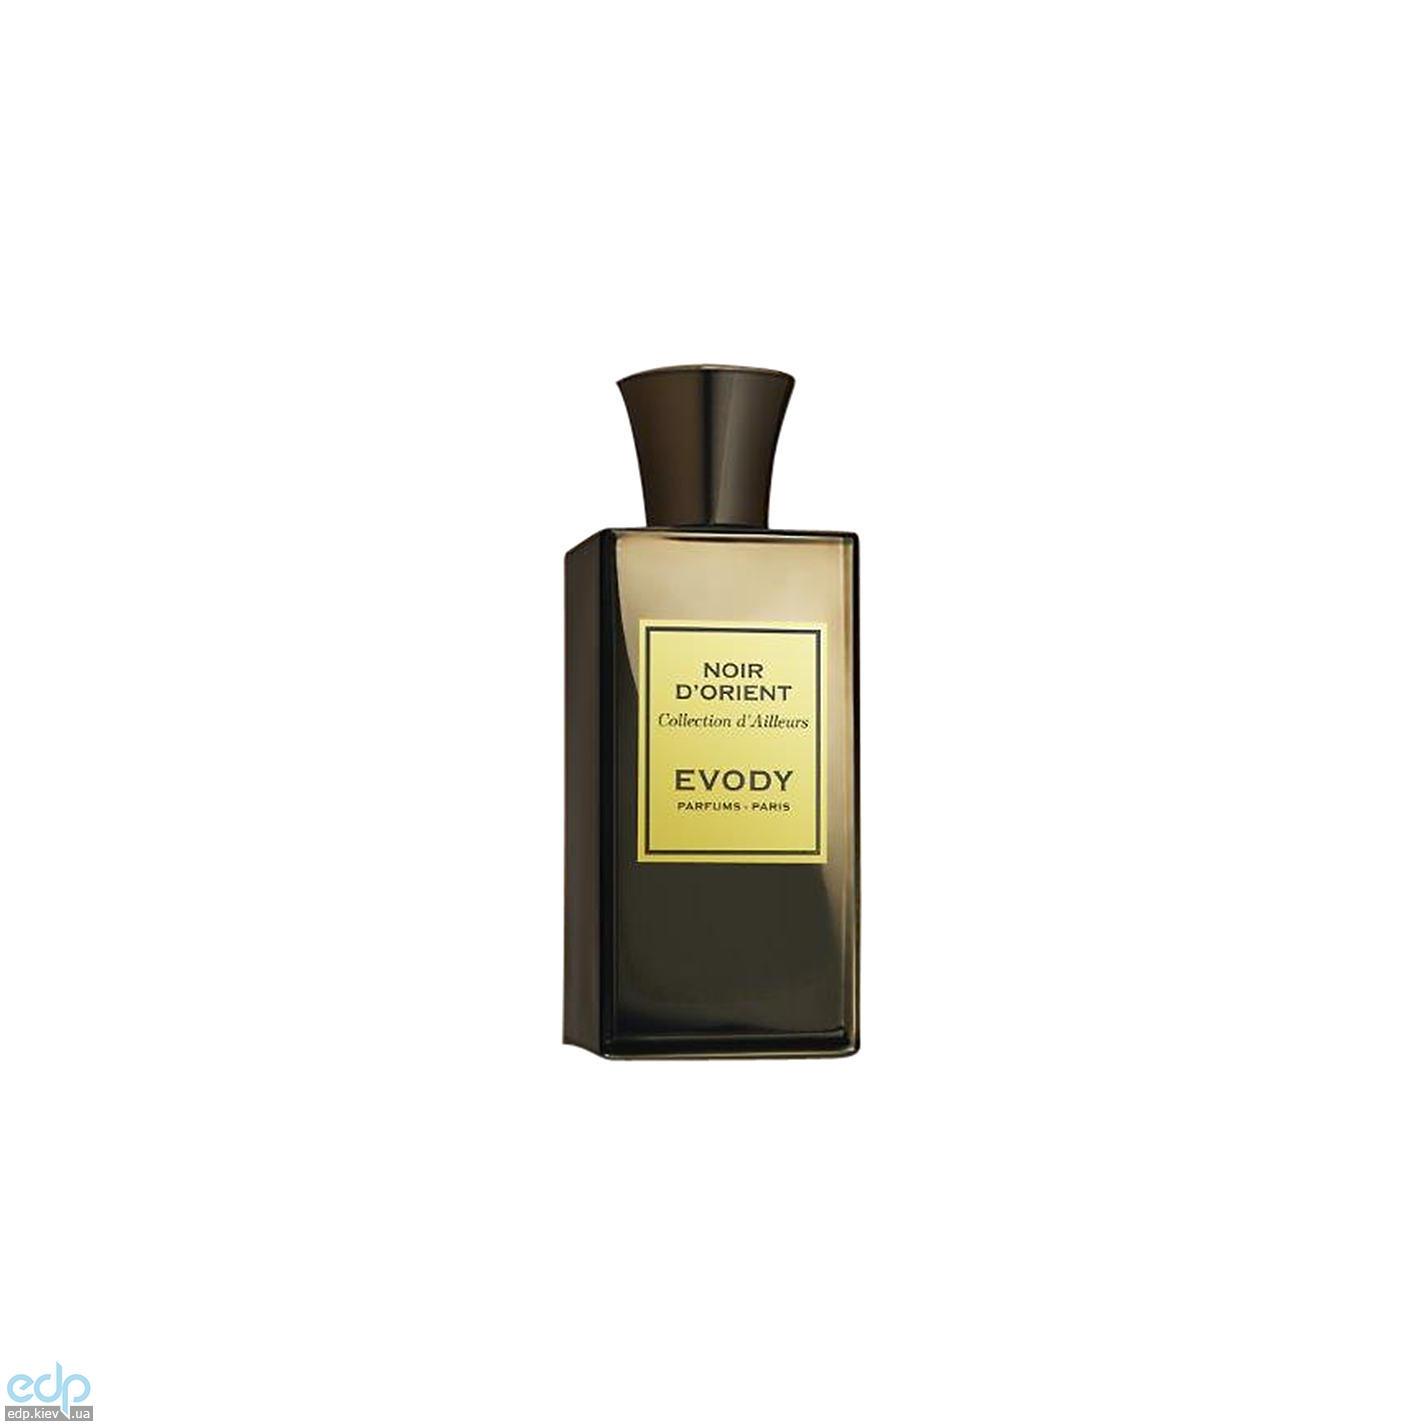 Evody Parfums Noir dOrient